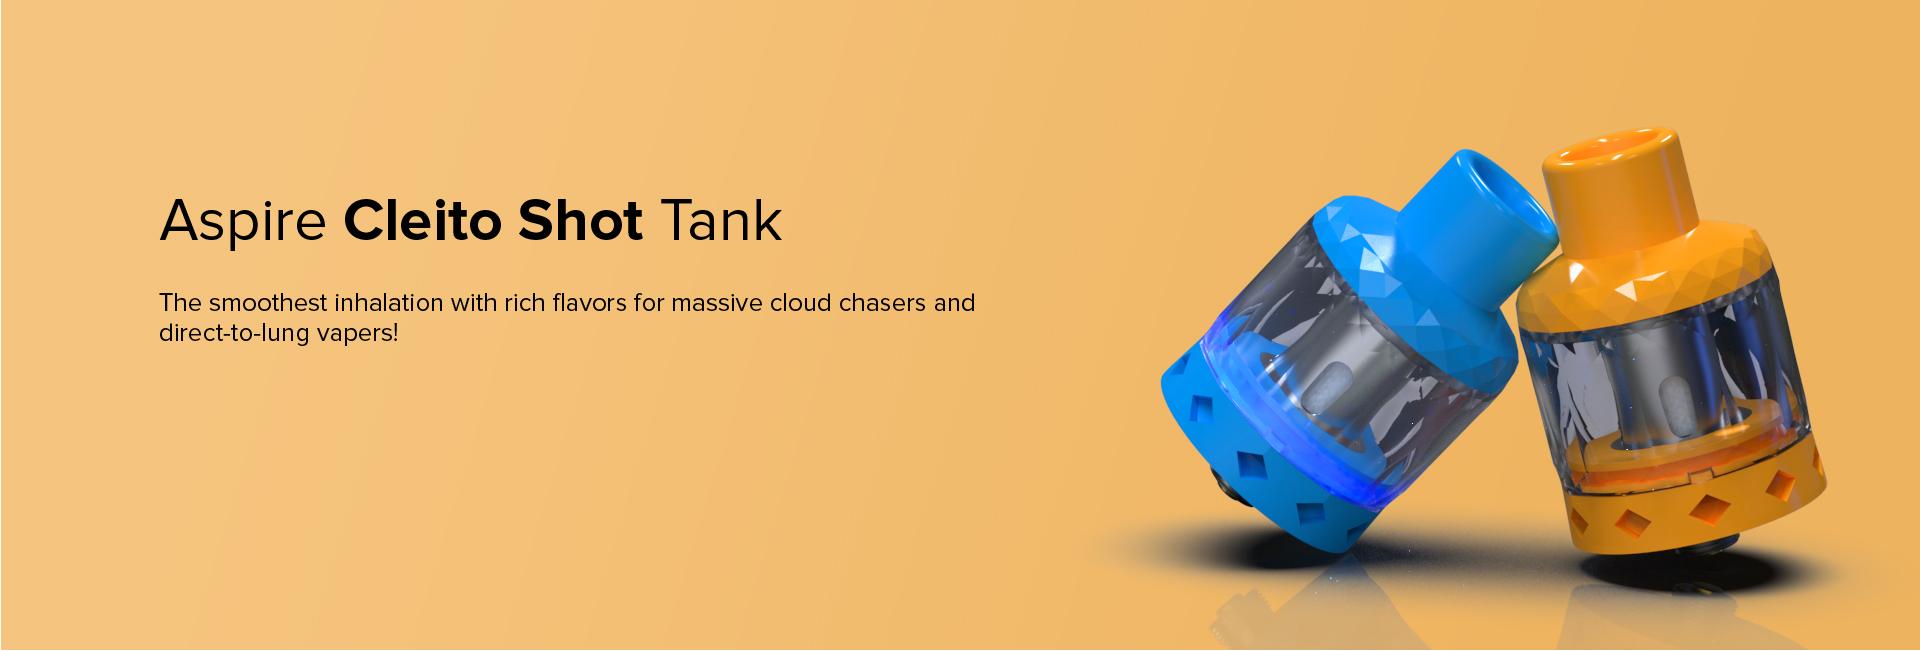 Aspire Cleito Shot Tank